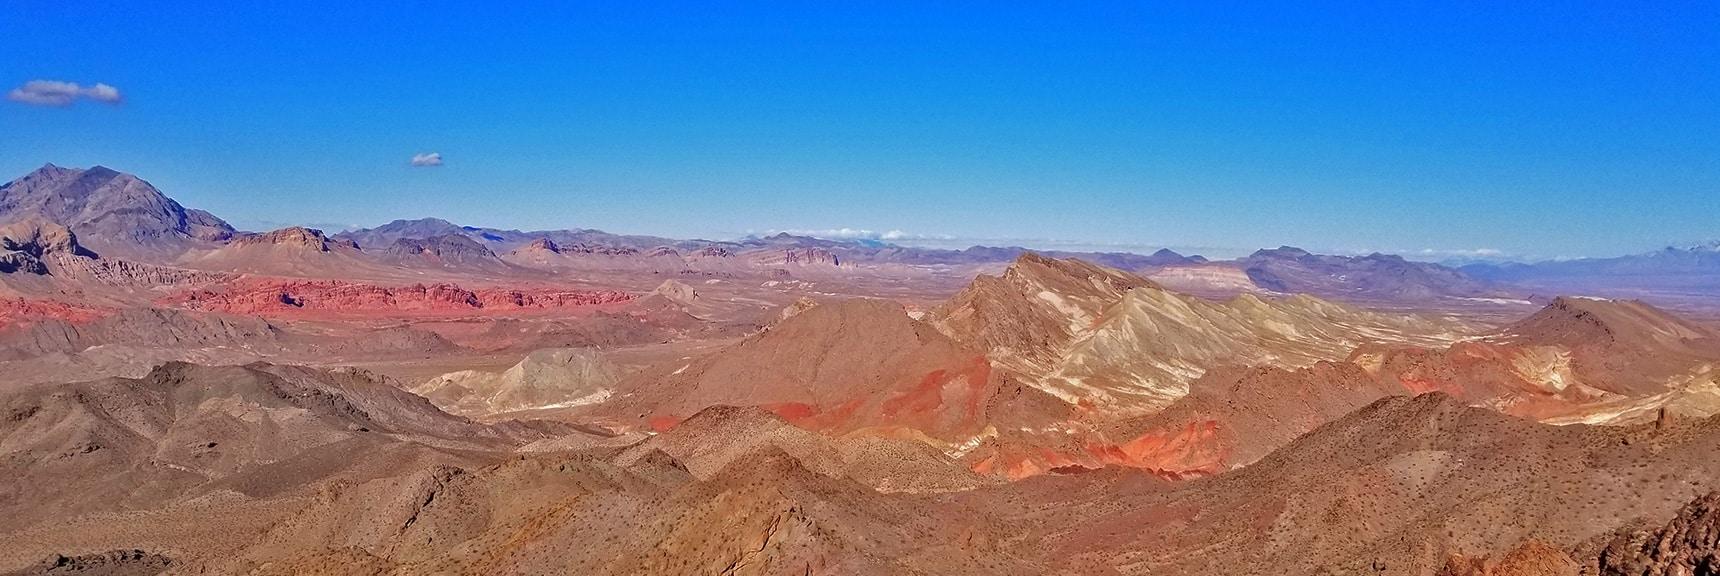 Northwest View from Hamblin Mt. Summit | Hamblin Mountain, Lake Mead National Conservation Area, Nevada